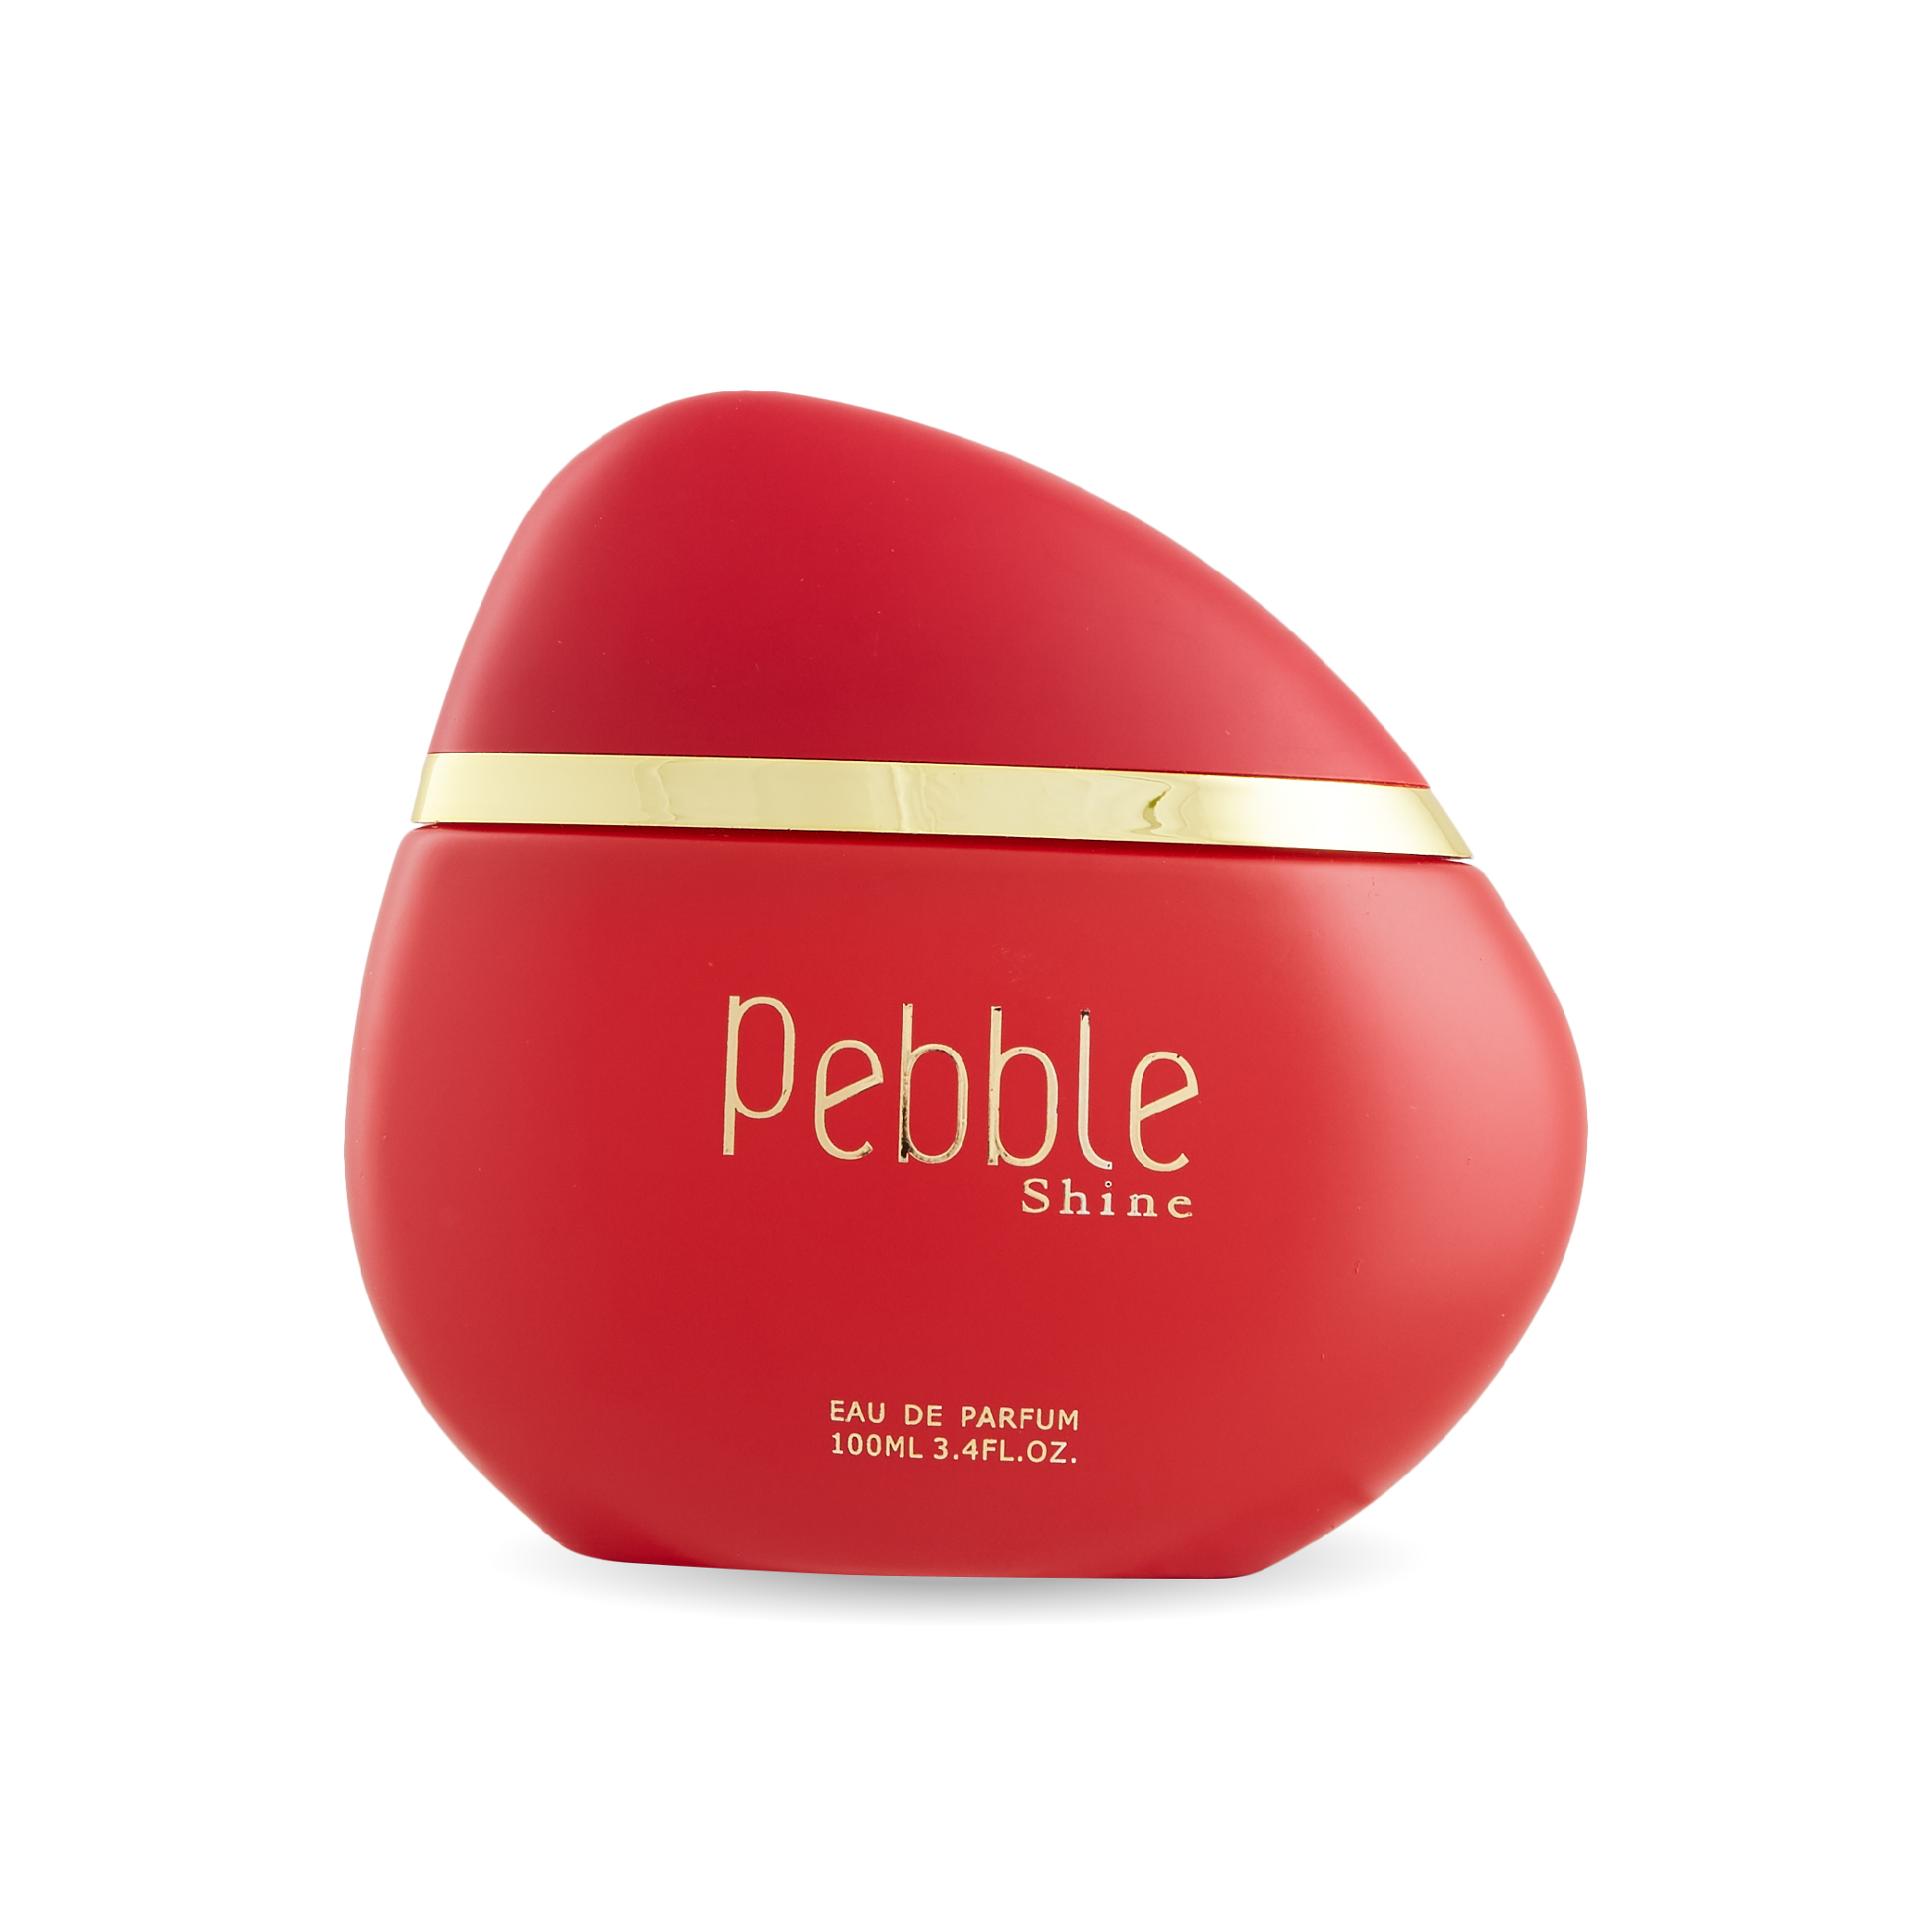 Maryaj | PEBBLE SHINE EAU DE PARFUM 100 ML